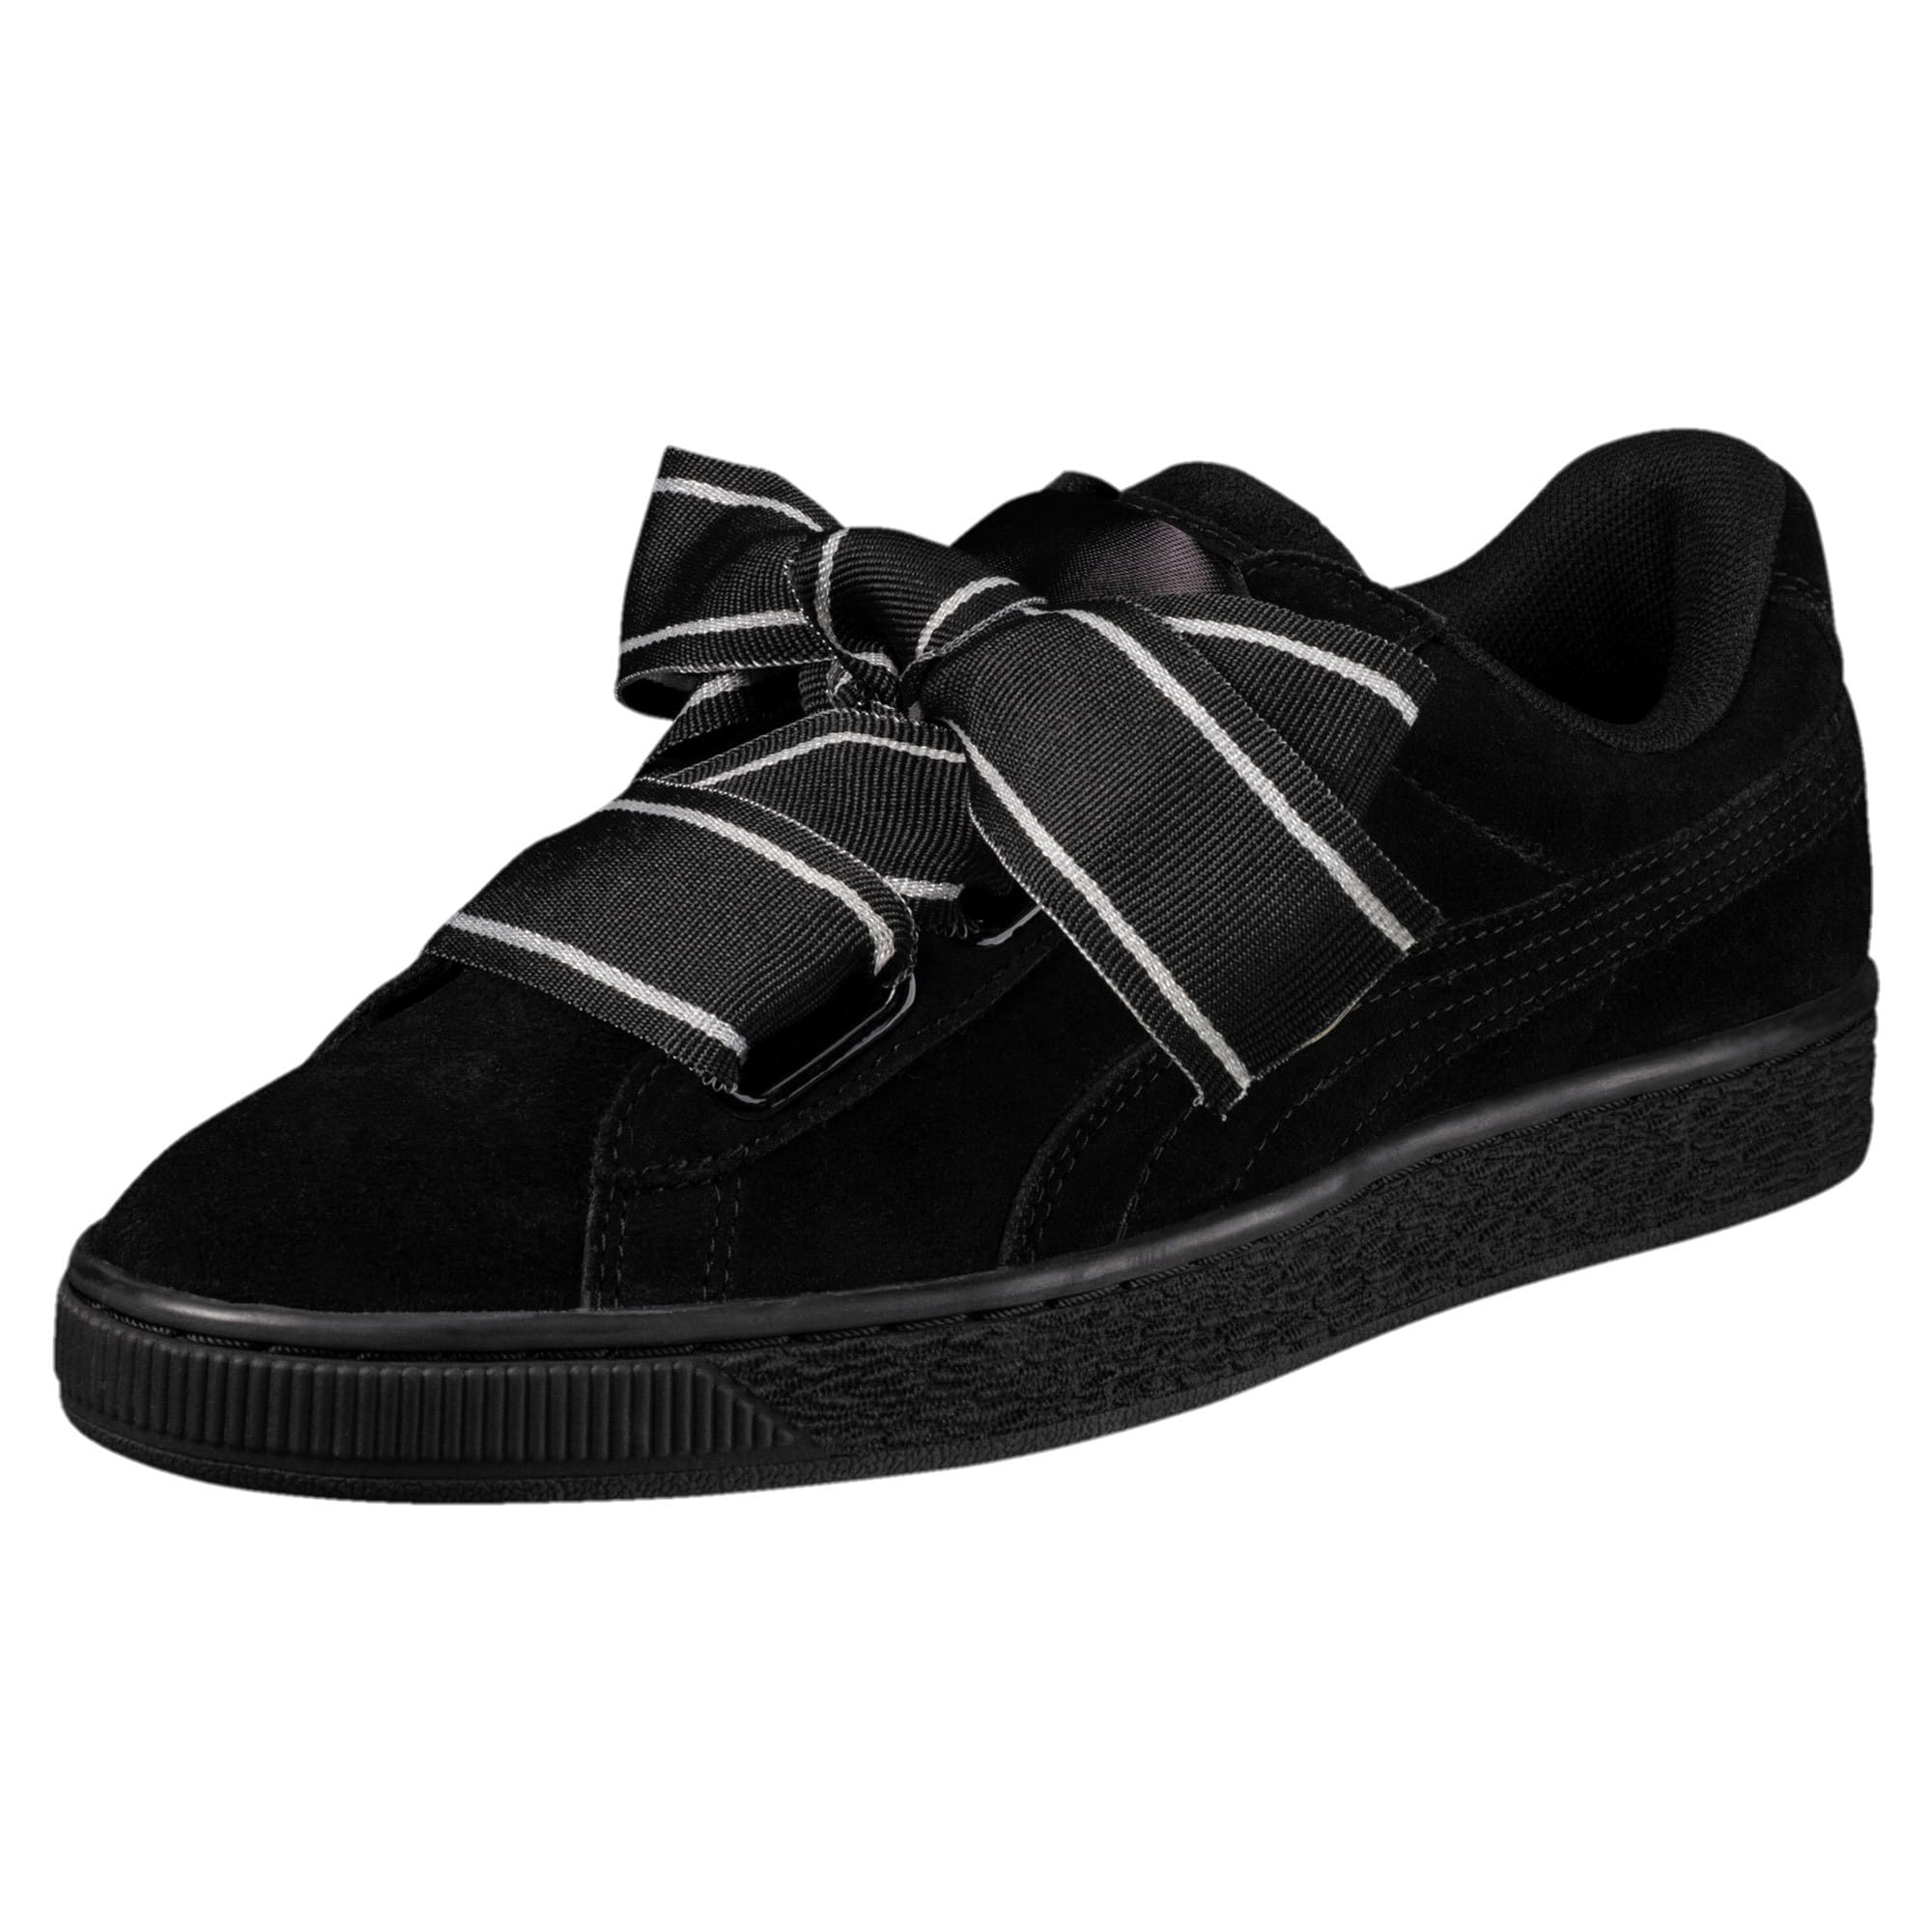 promo code f2f0c 89ba8 Suede Heart Satin II Women's Sneakers